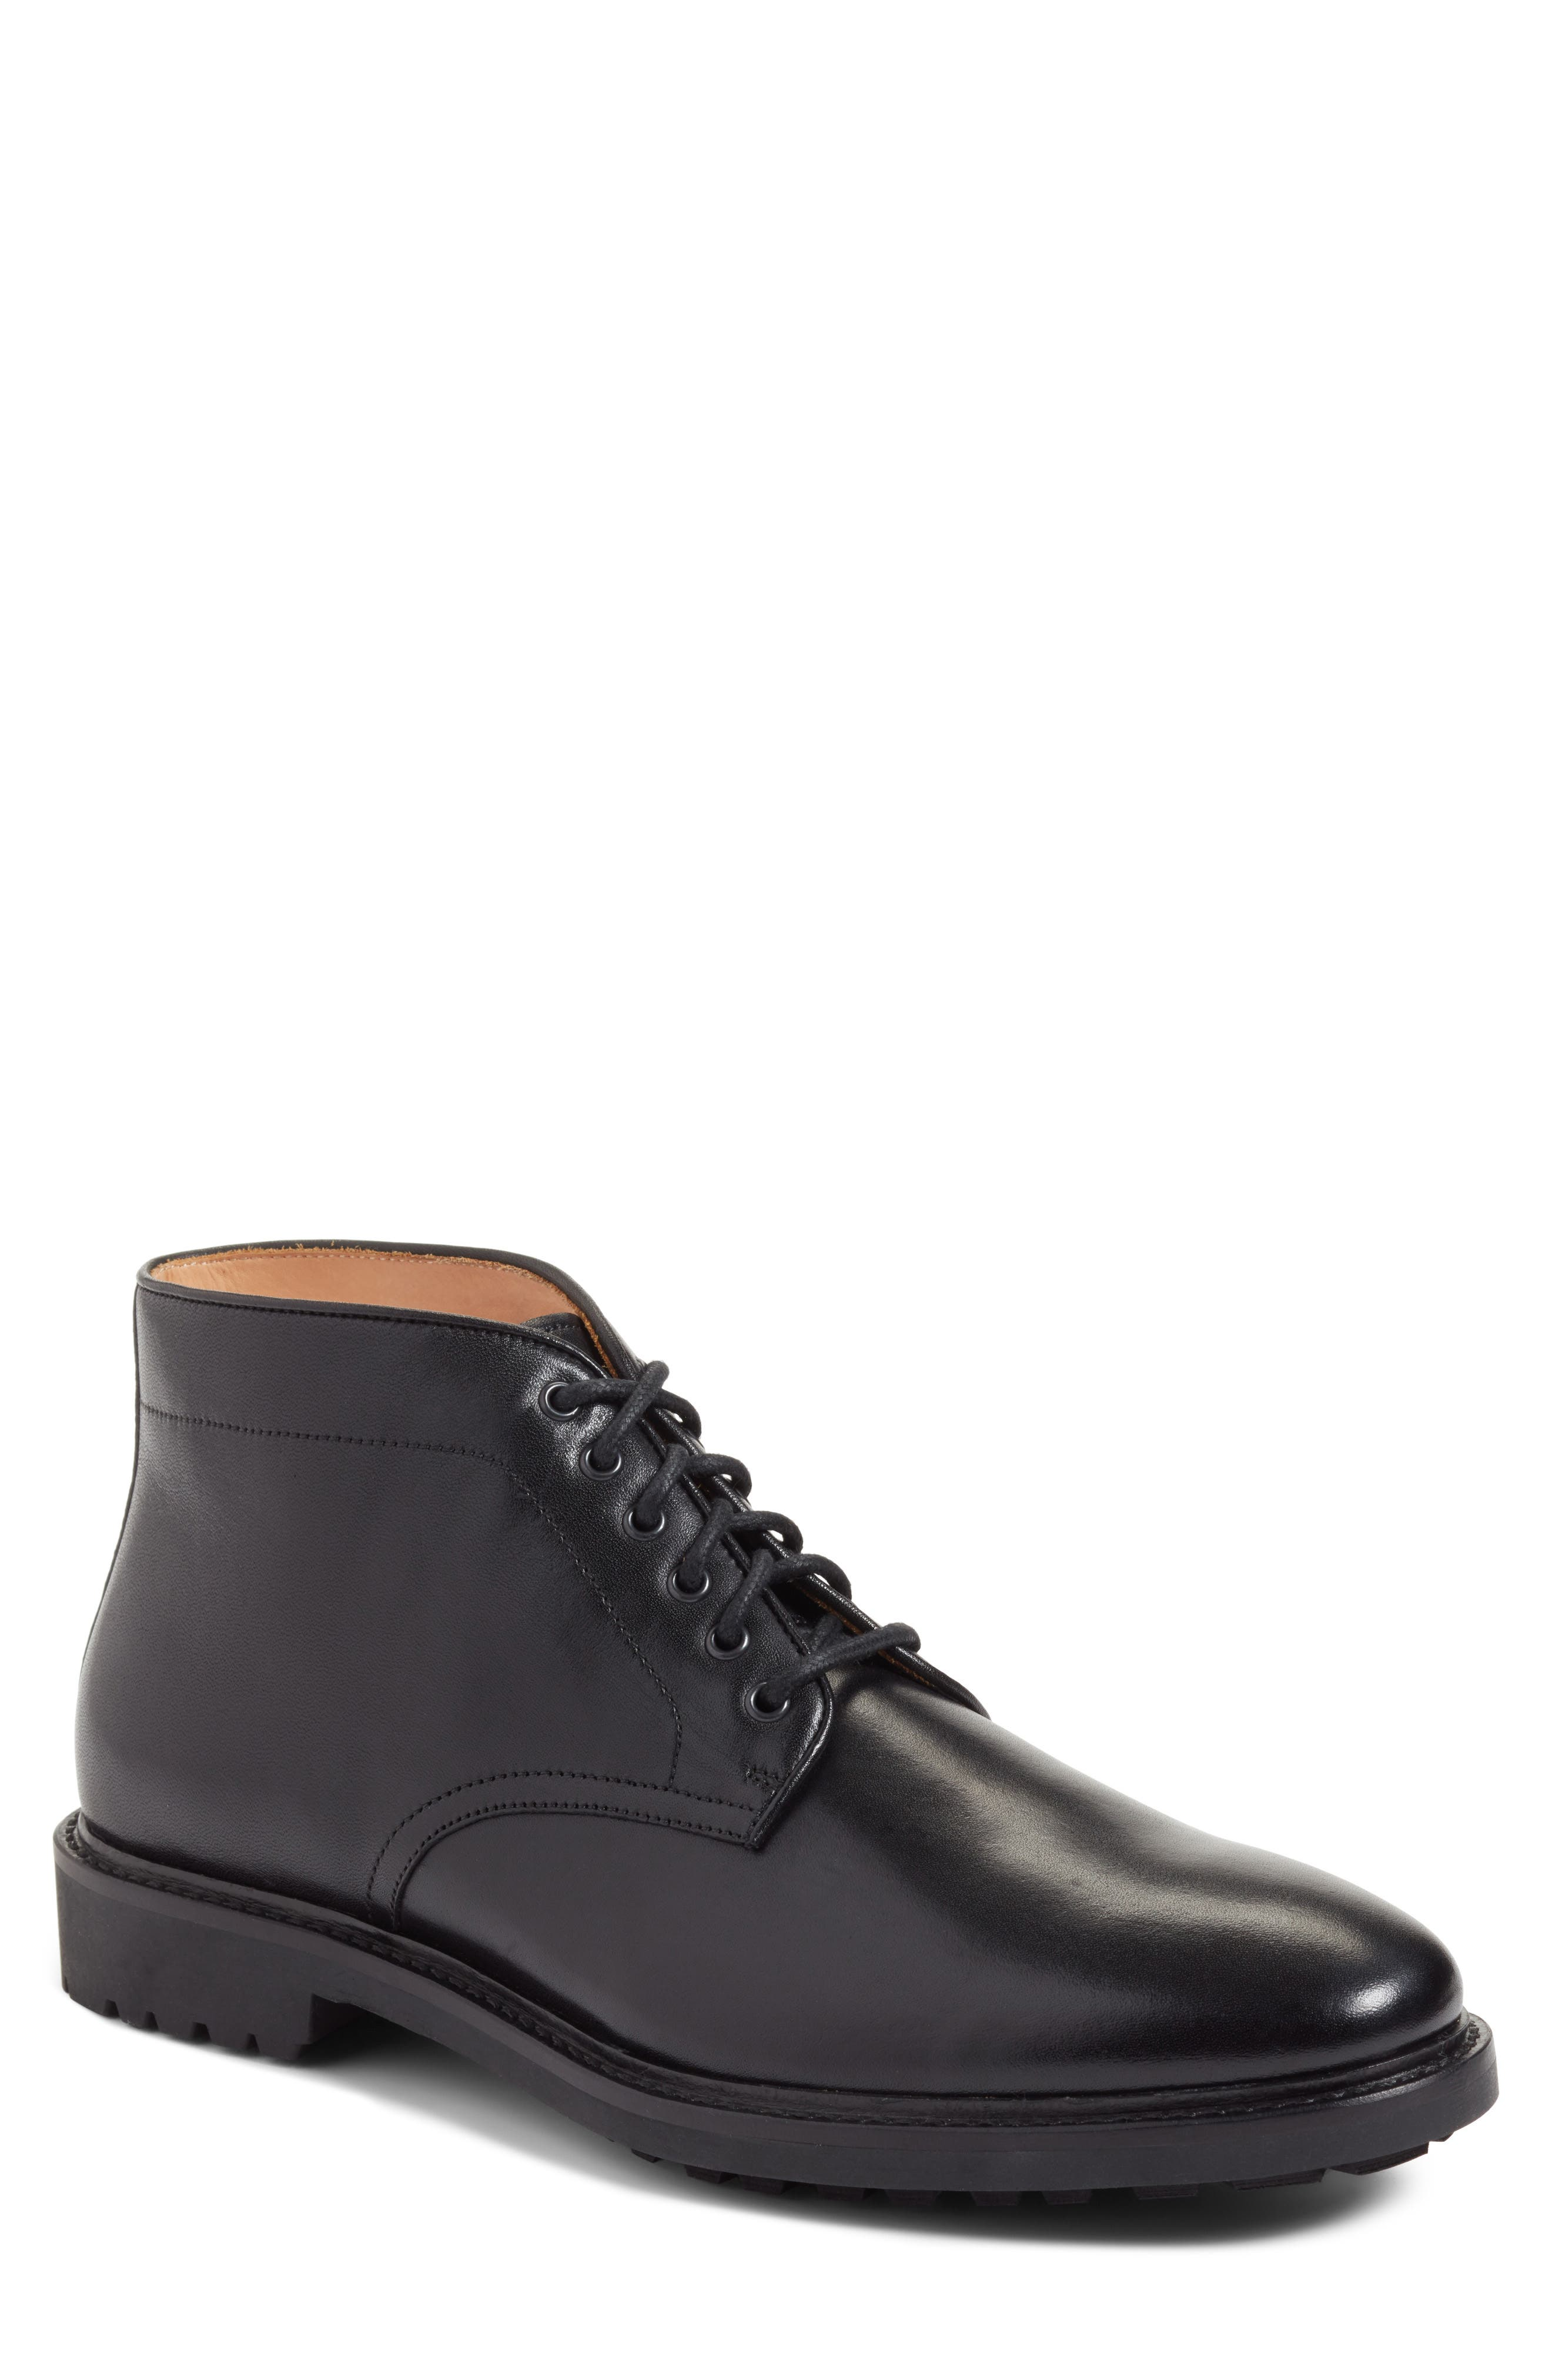 Ramiro Plain Toe Boot,                         Main,                         color, Black Leather